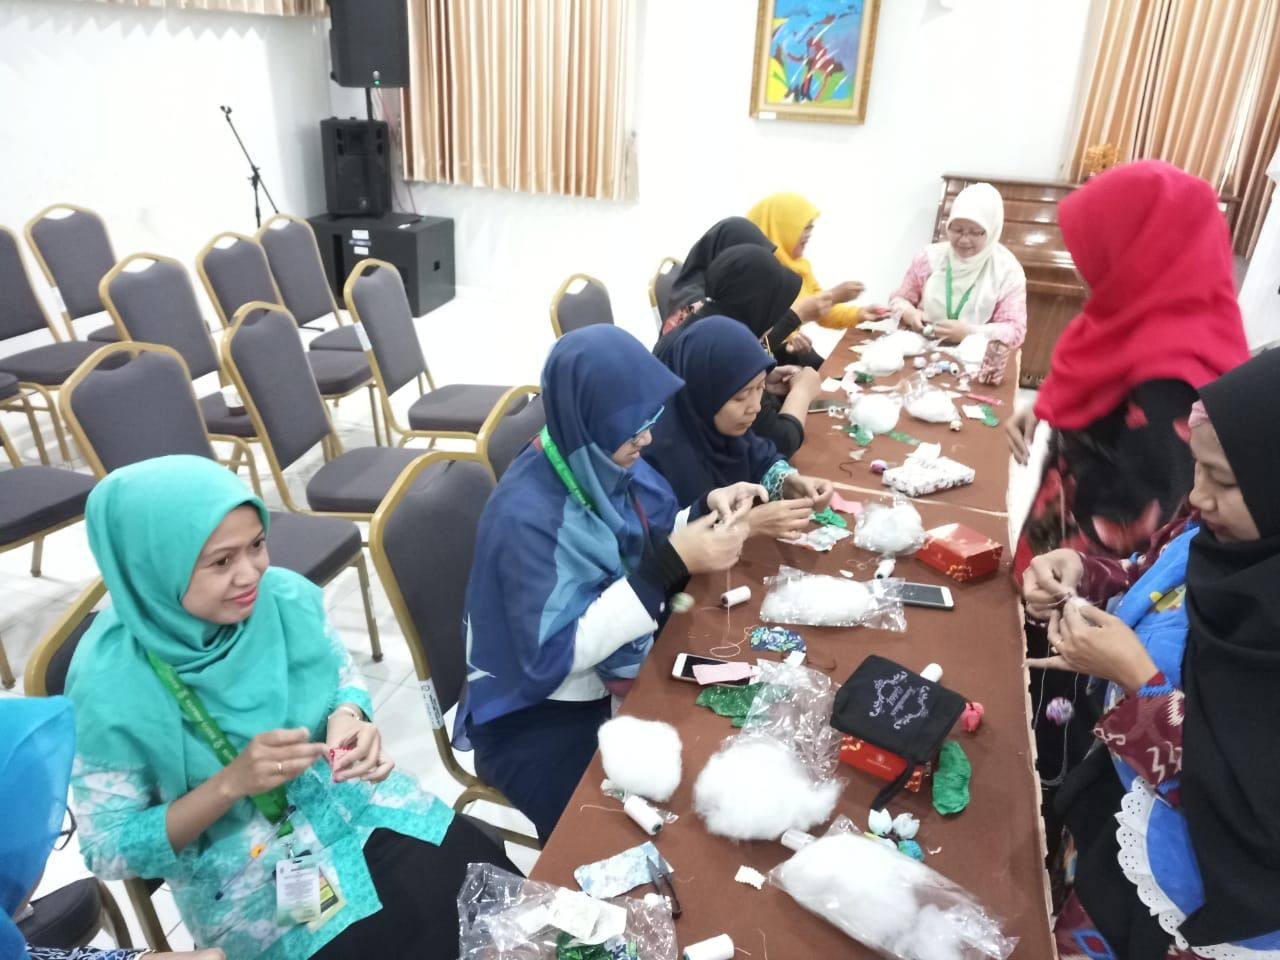 Deskripsi : Keterampilan tangan bertajuk workshop jari cantik yang dibimbing oleh ibu Mila Virminia perwakilan dari Dharma Wanita PPSDM Kemenkes RI I Sumber Foto : dokpri RSKO Jakarta